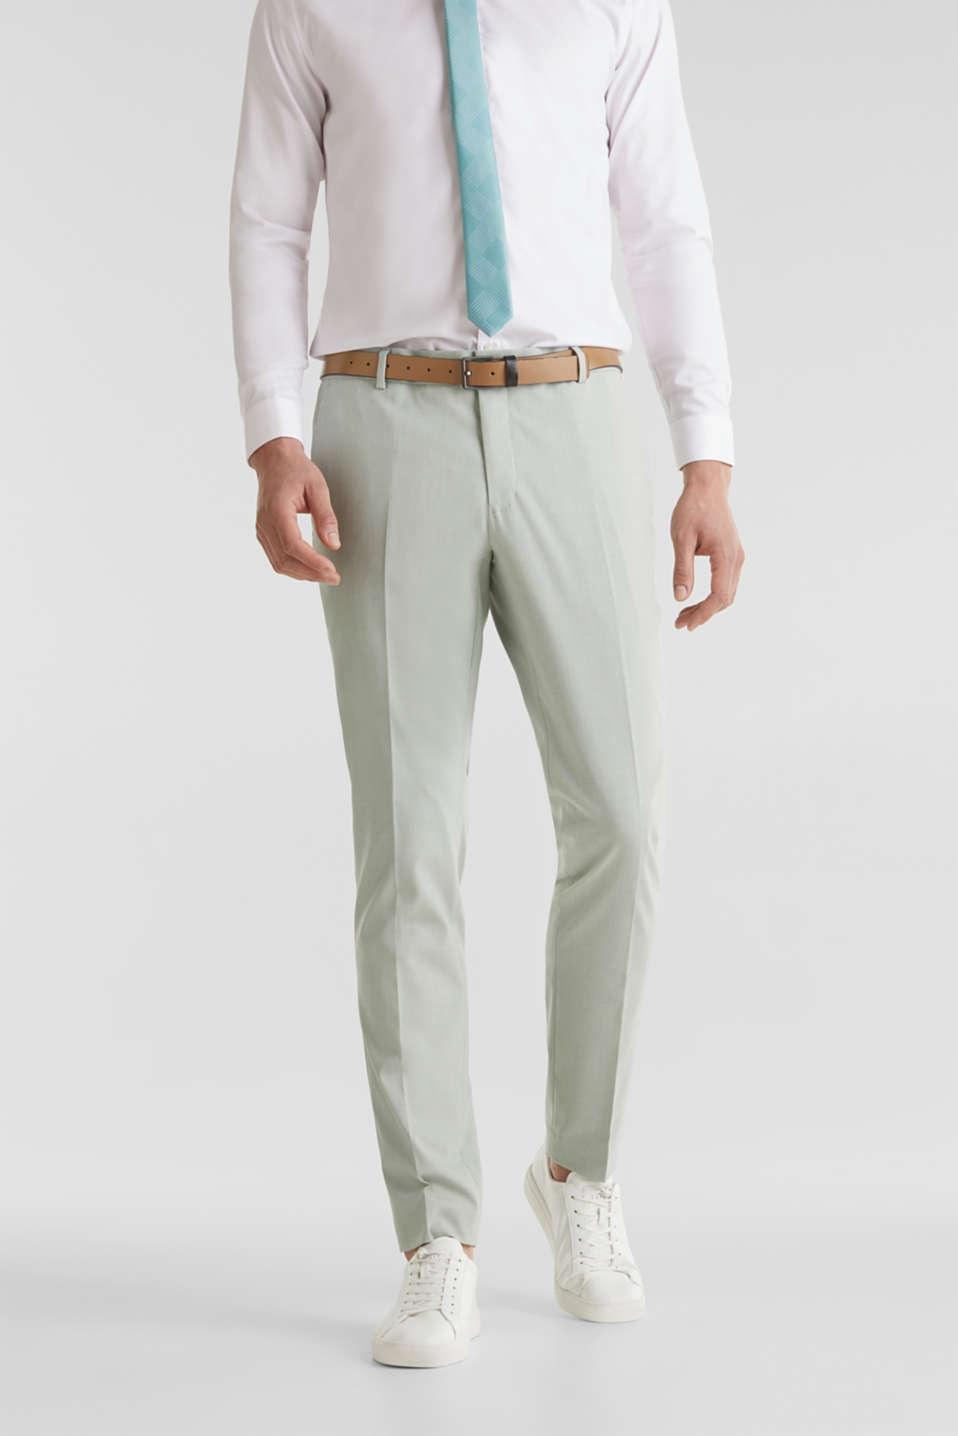 FINE MELANGE mix + match trousers, PASTEL GREEN 5, detail image number 4